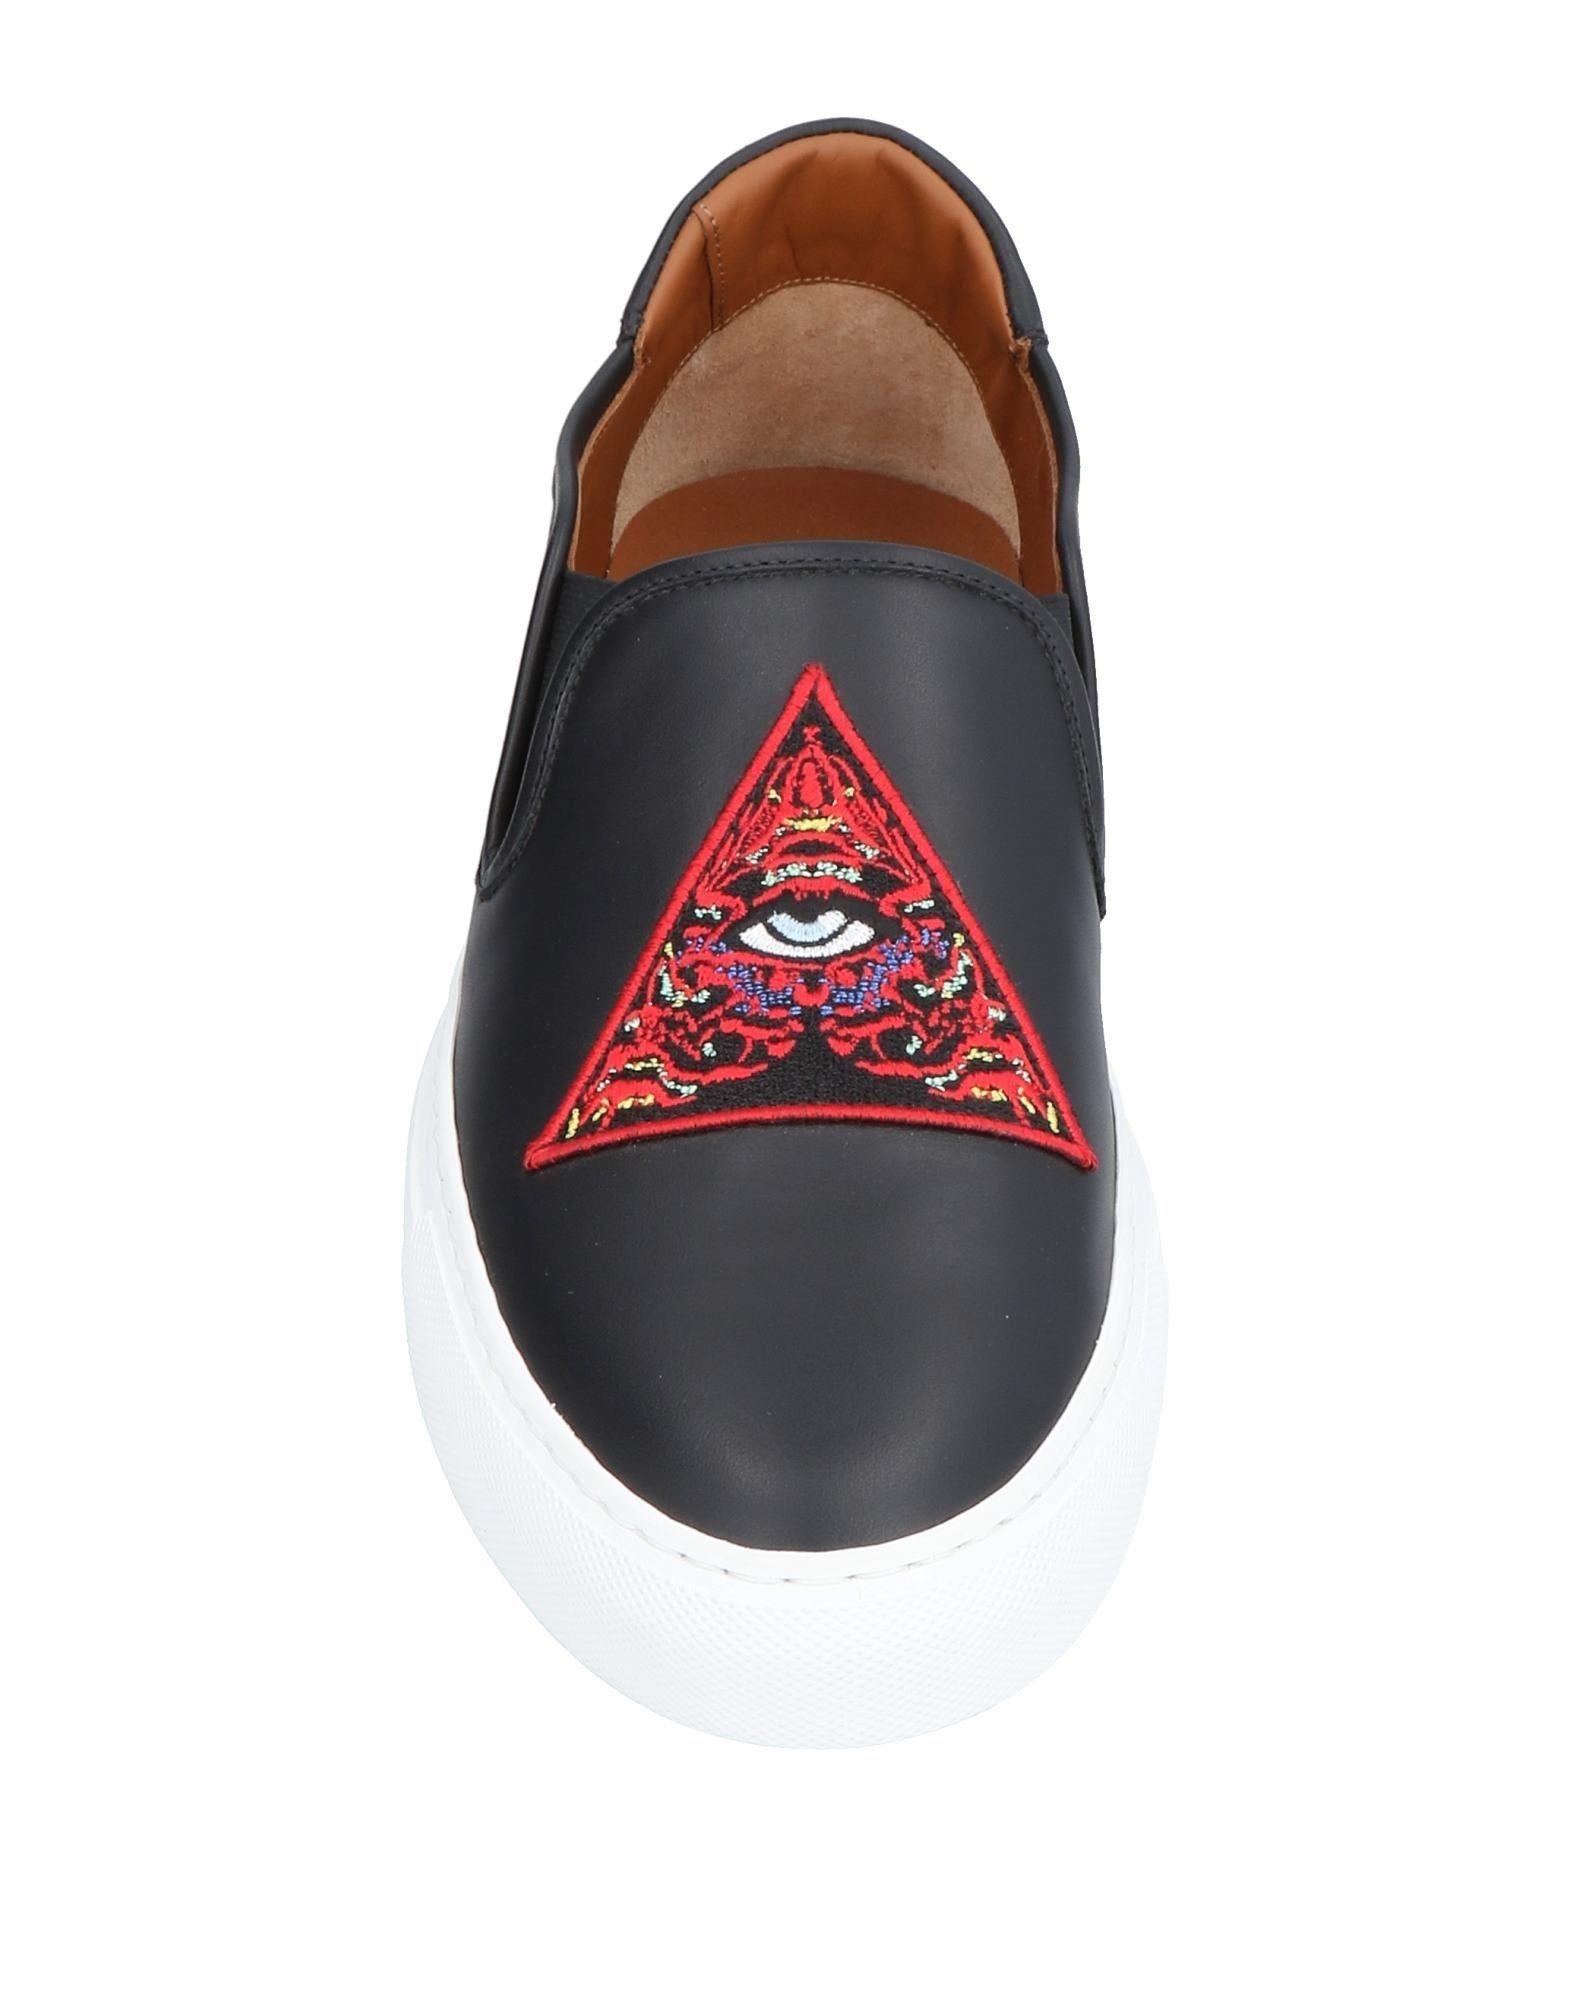 Givenchy 11496126JT Sneakers Herren  11496126JT Givenchy Gute Qualität beliebte Schuhe 7ec3b0